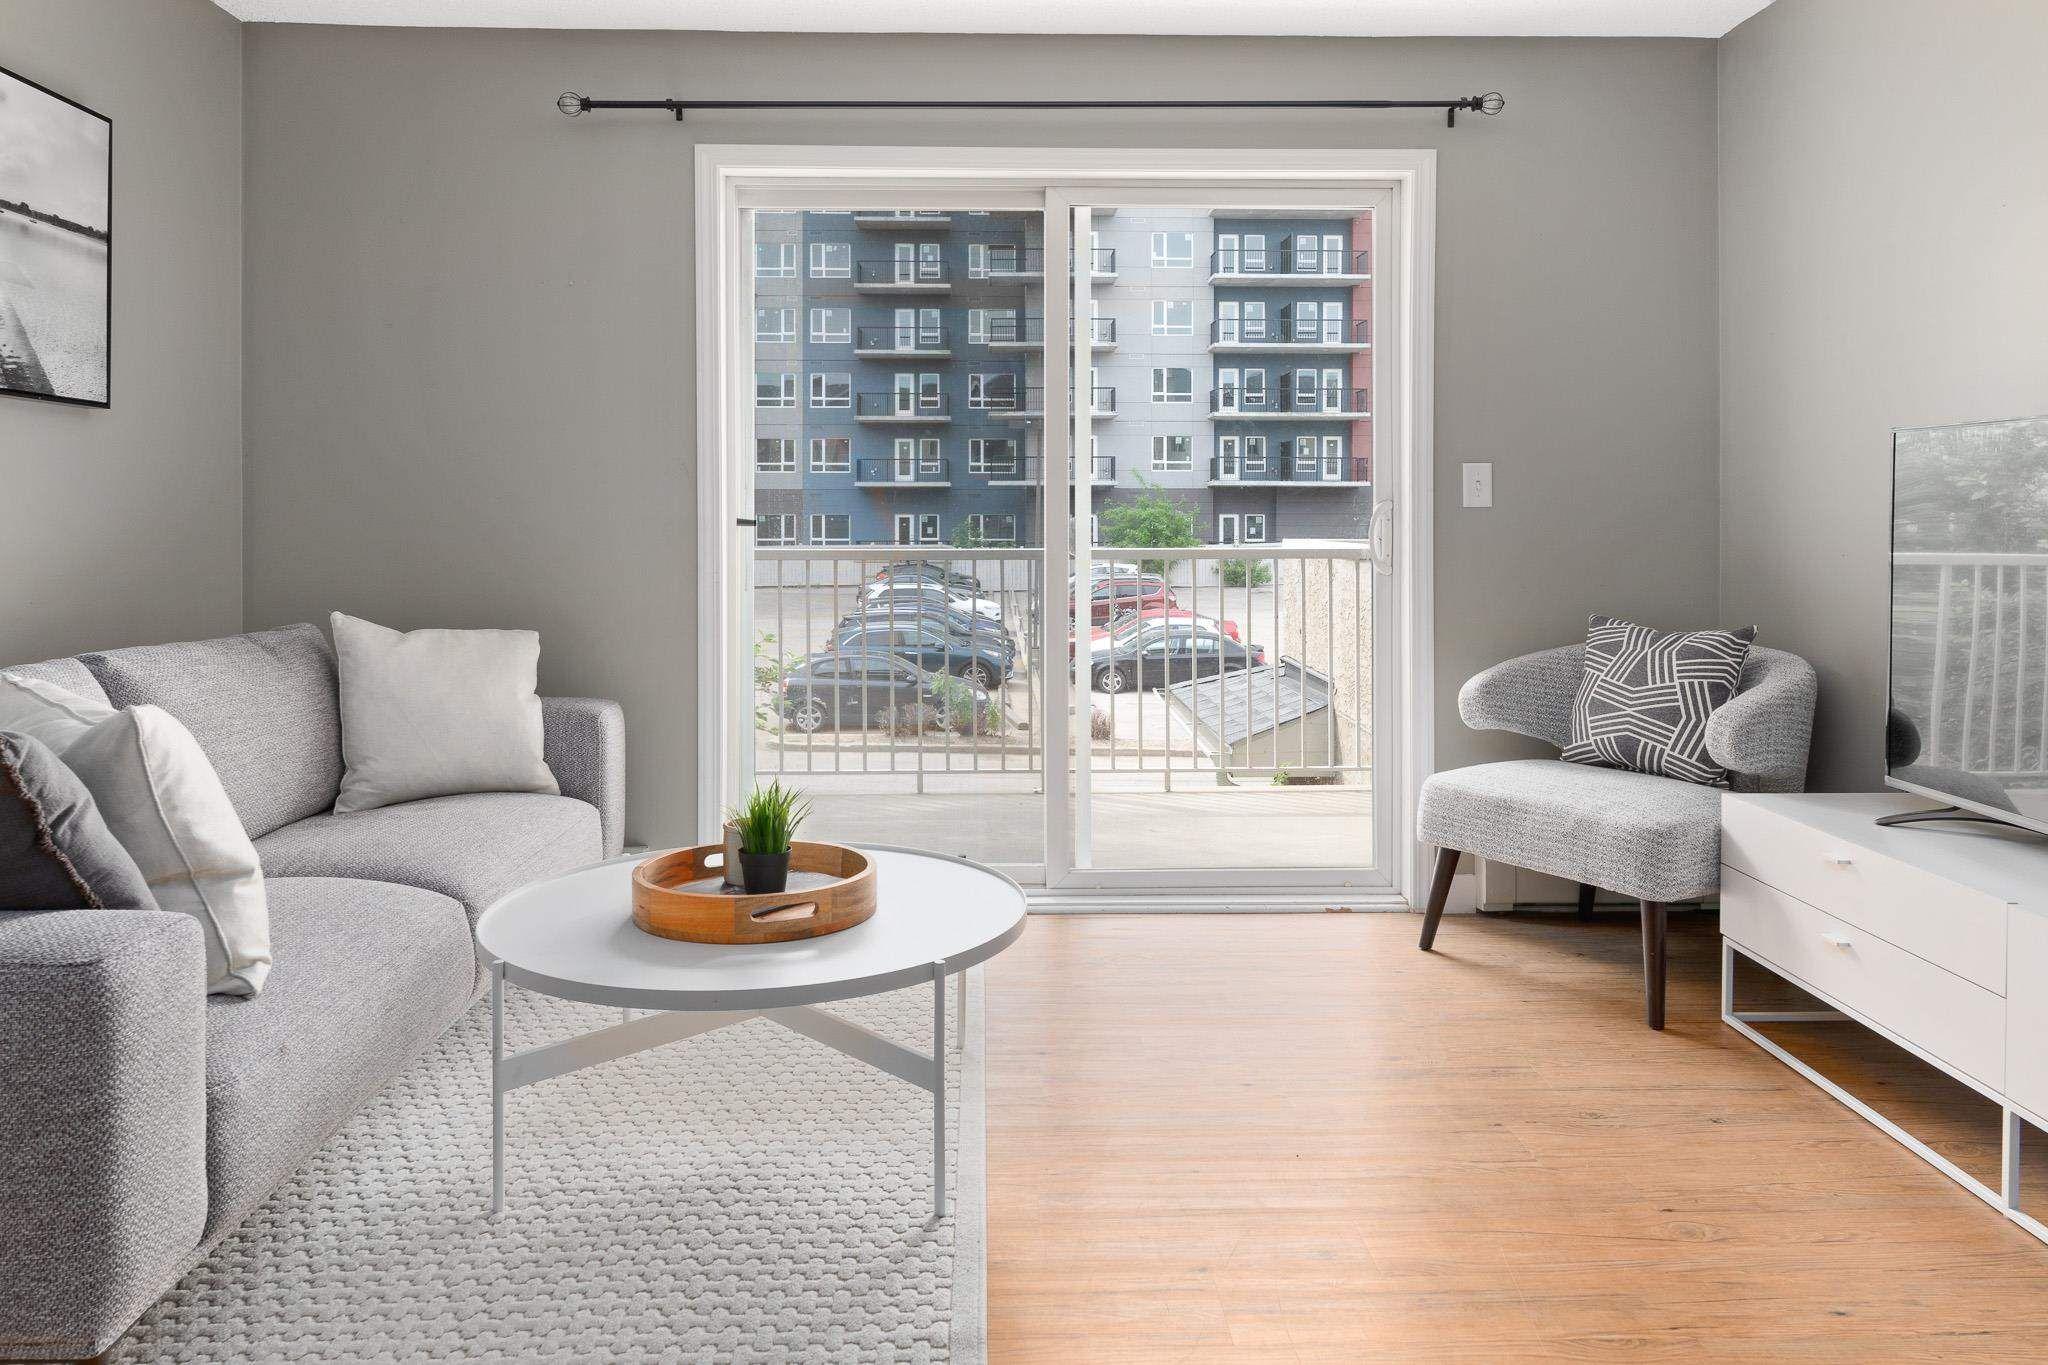 Main Photo: 233 10535 122 Street NW in Edmonton: Zone 07 Condo for sale : MLS®# E4248359